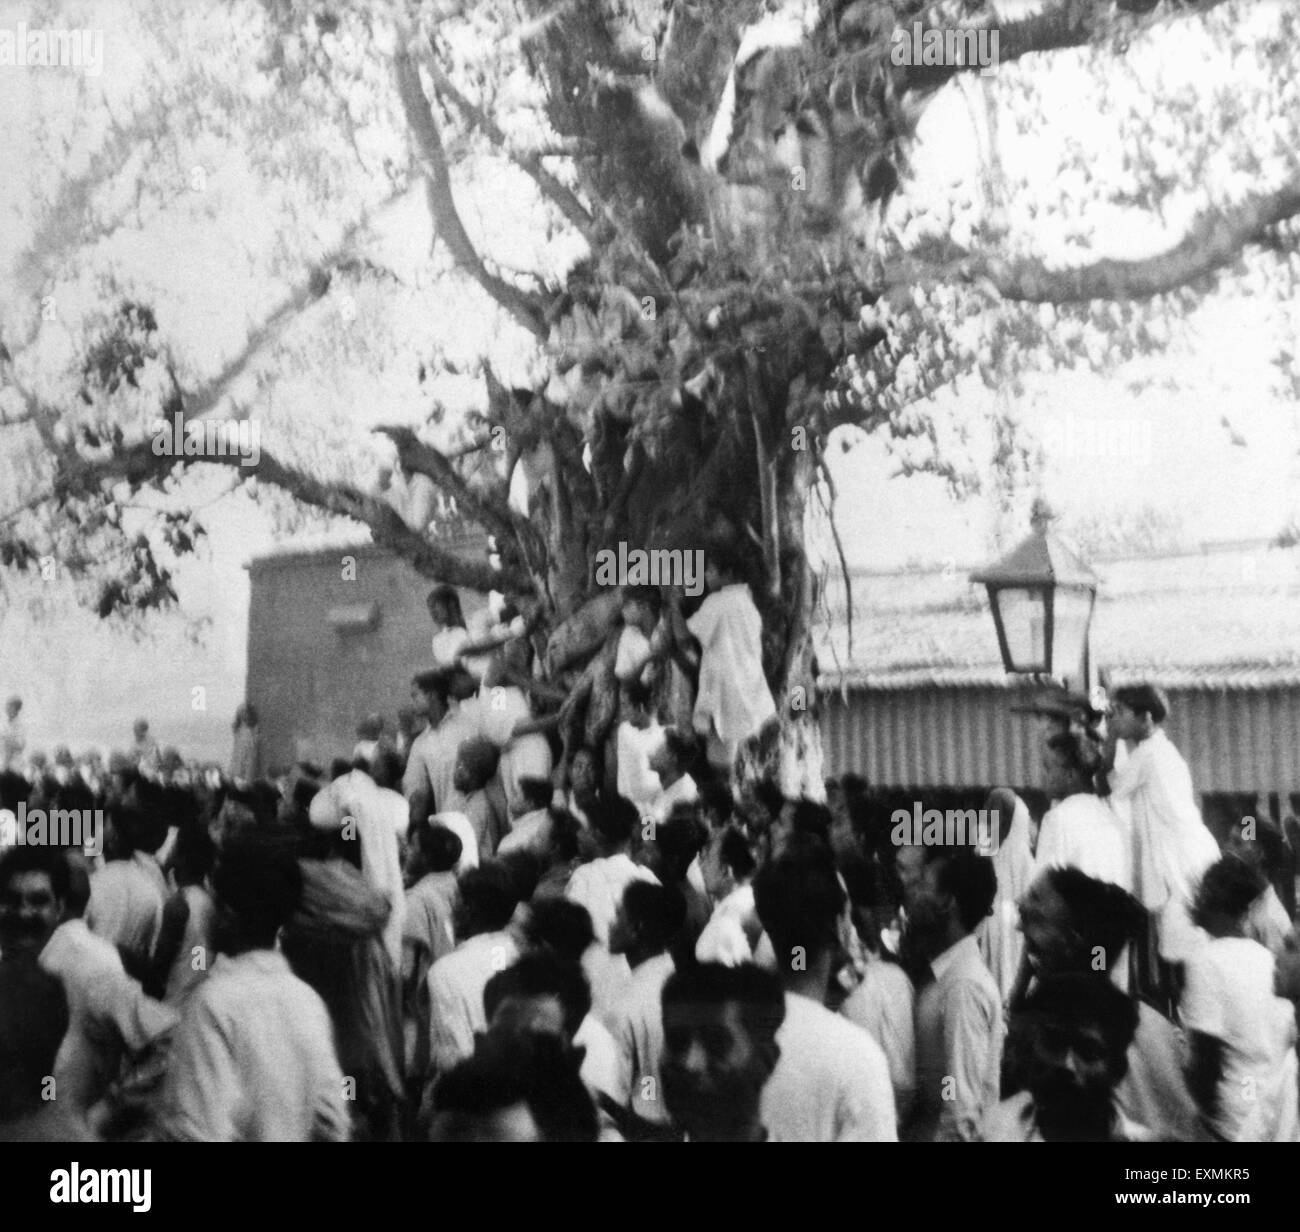 People watching Mahatma Gandhi accompanied by Khan Abdul Gaffar Khan ; leaving a car in Bihar ; 1947 ; India NO - Stock Image